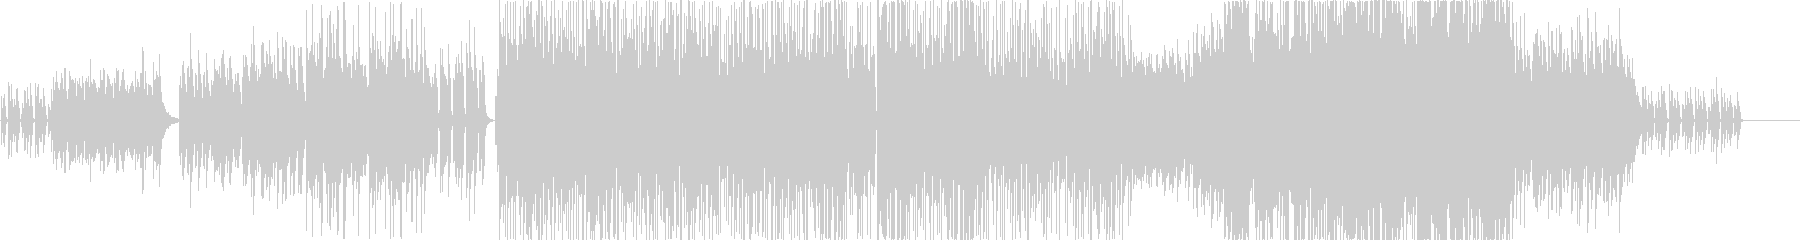 Ranunculusの未再生の波形